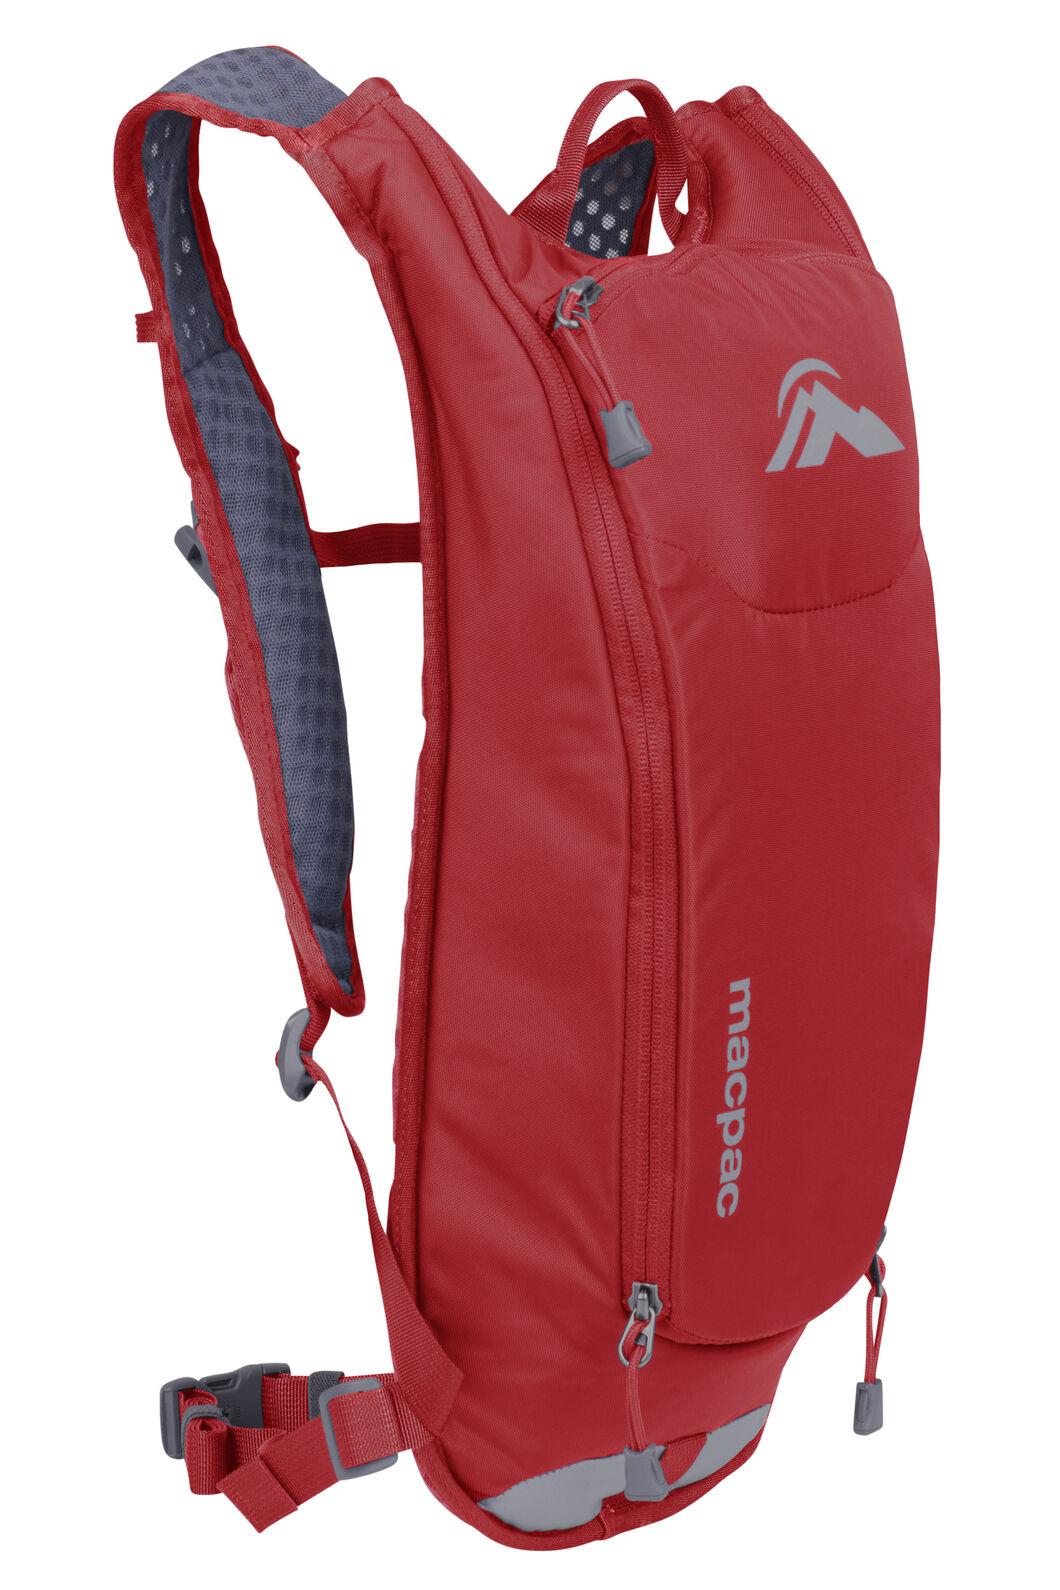 Macpac Amp H2O 2L Hydration Pack, Molten Lava, hi-res